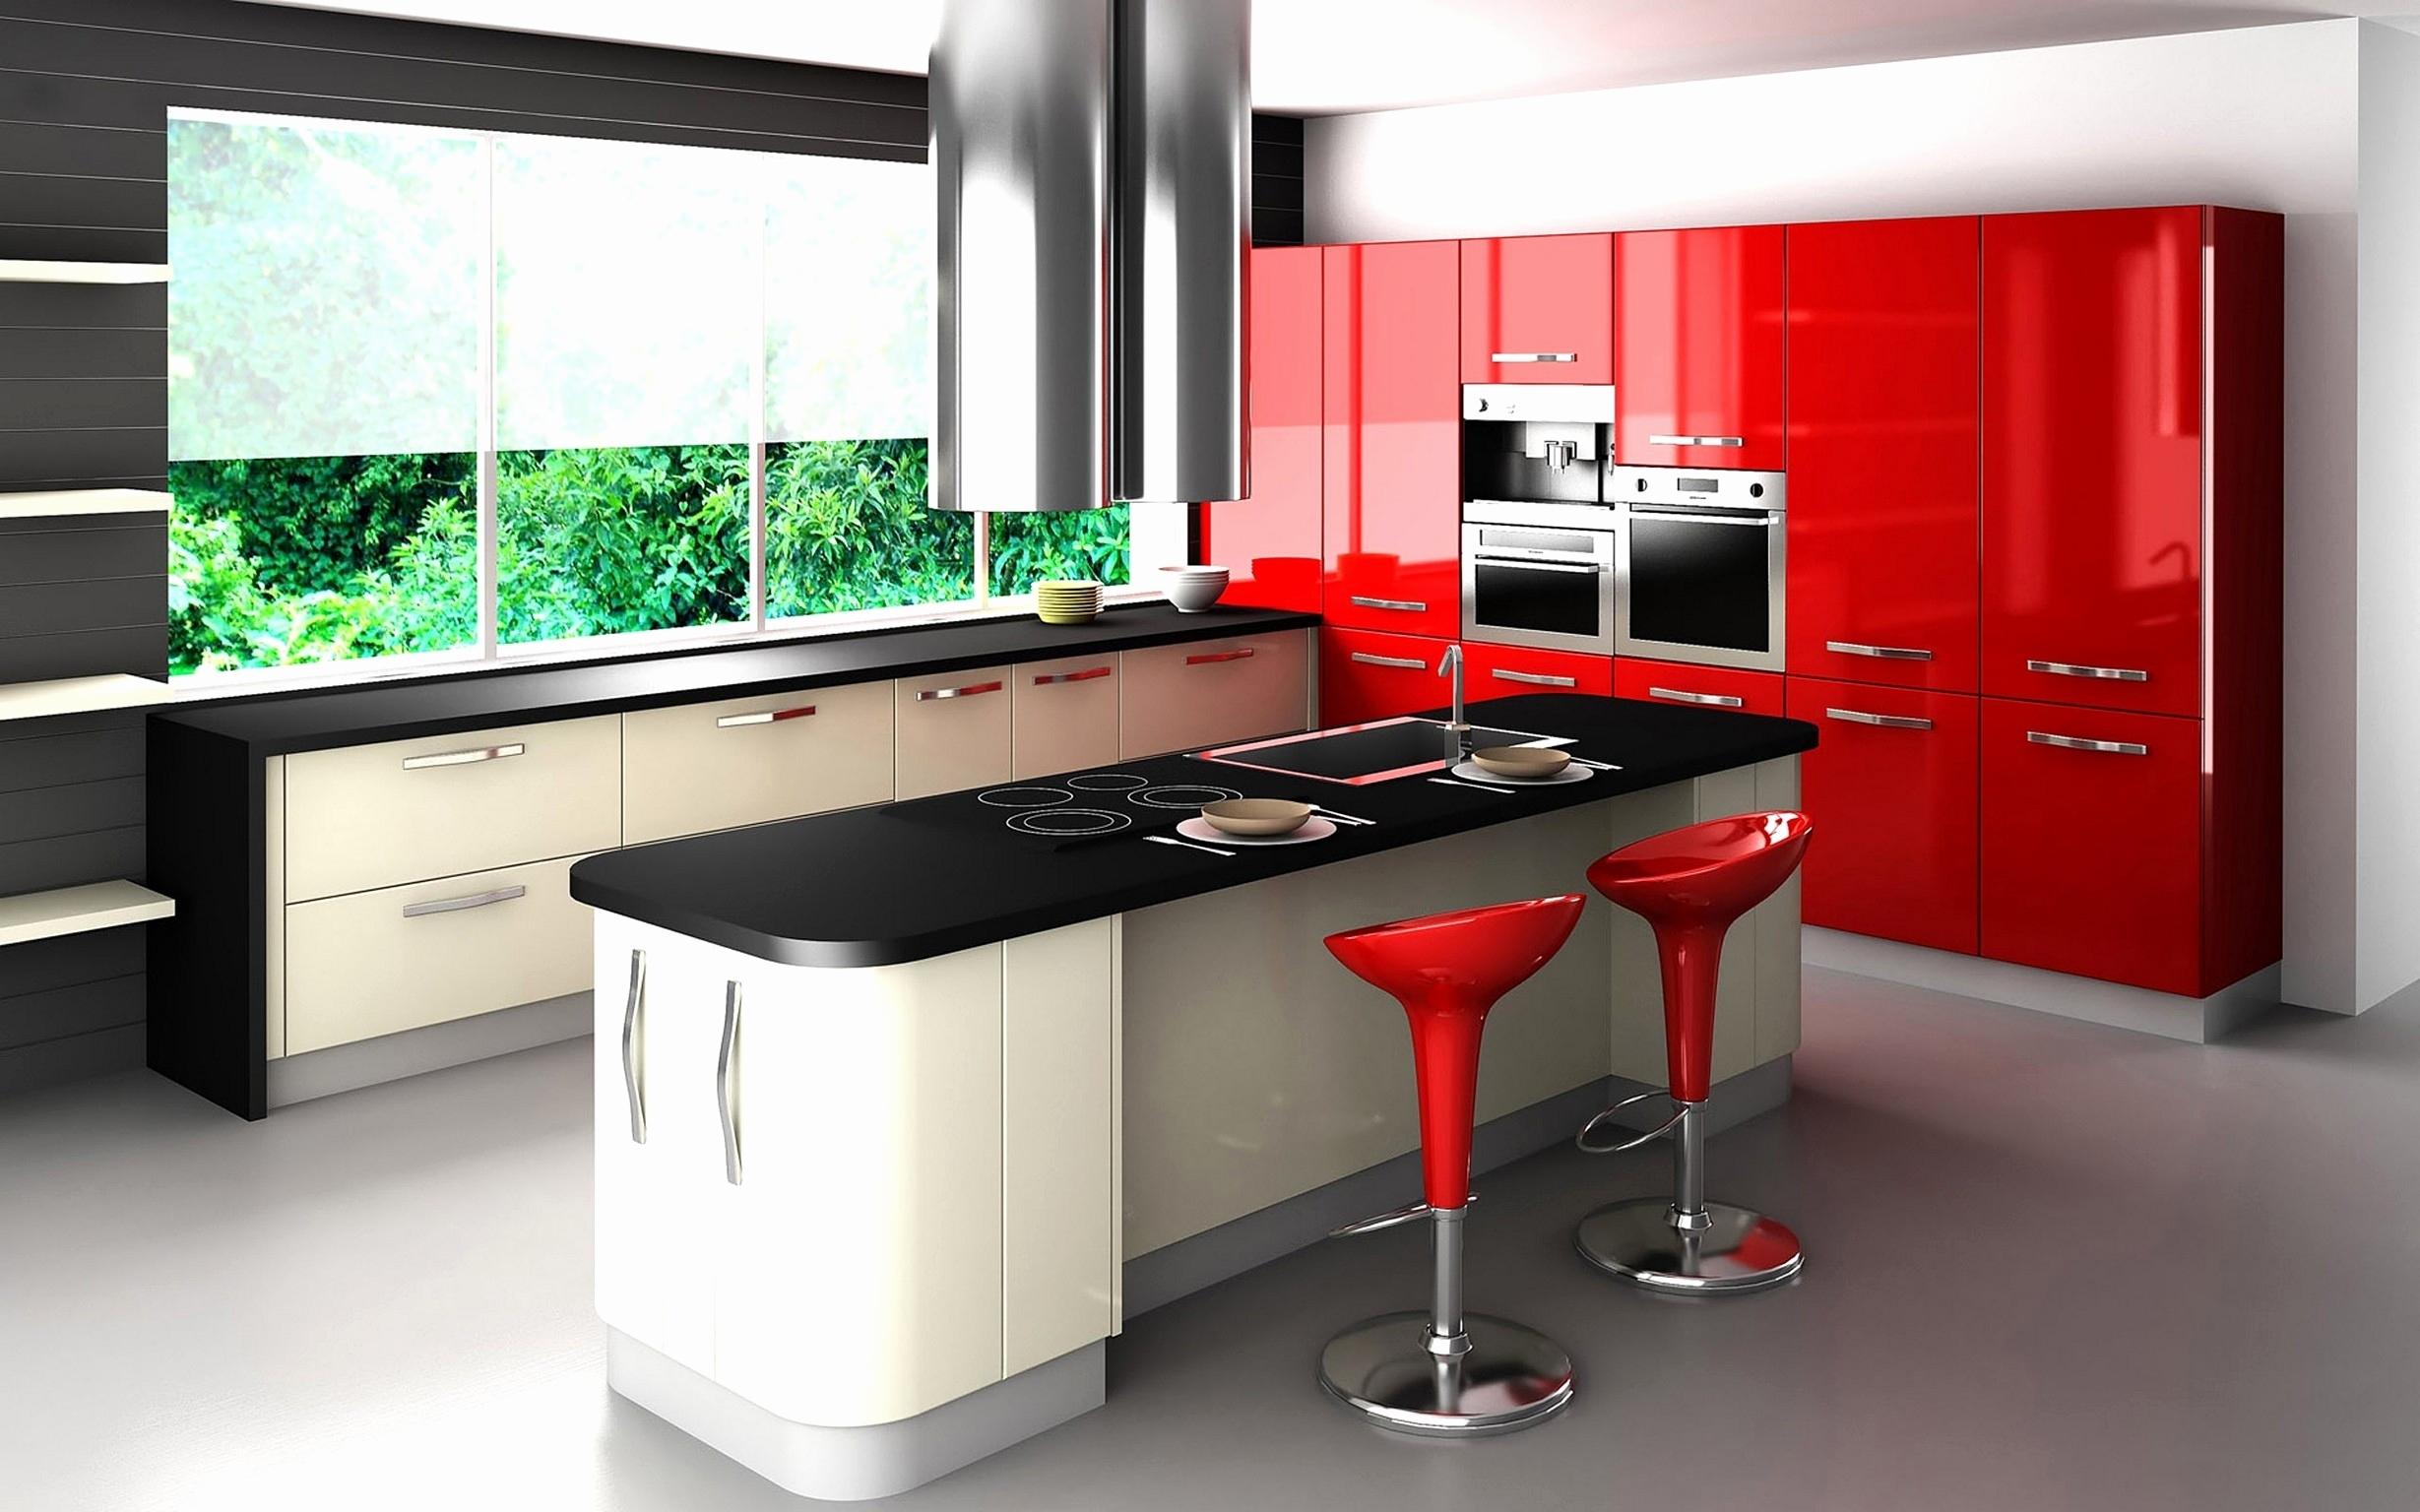 Home Interior Kitchen Designs 2458x1536 Wallpaper Teahub Io